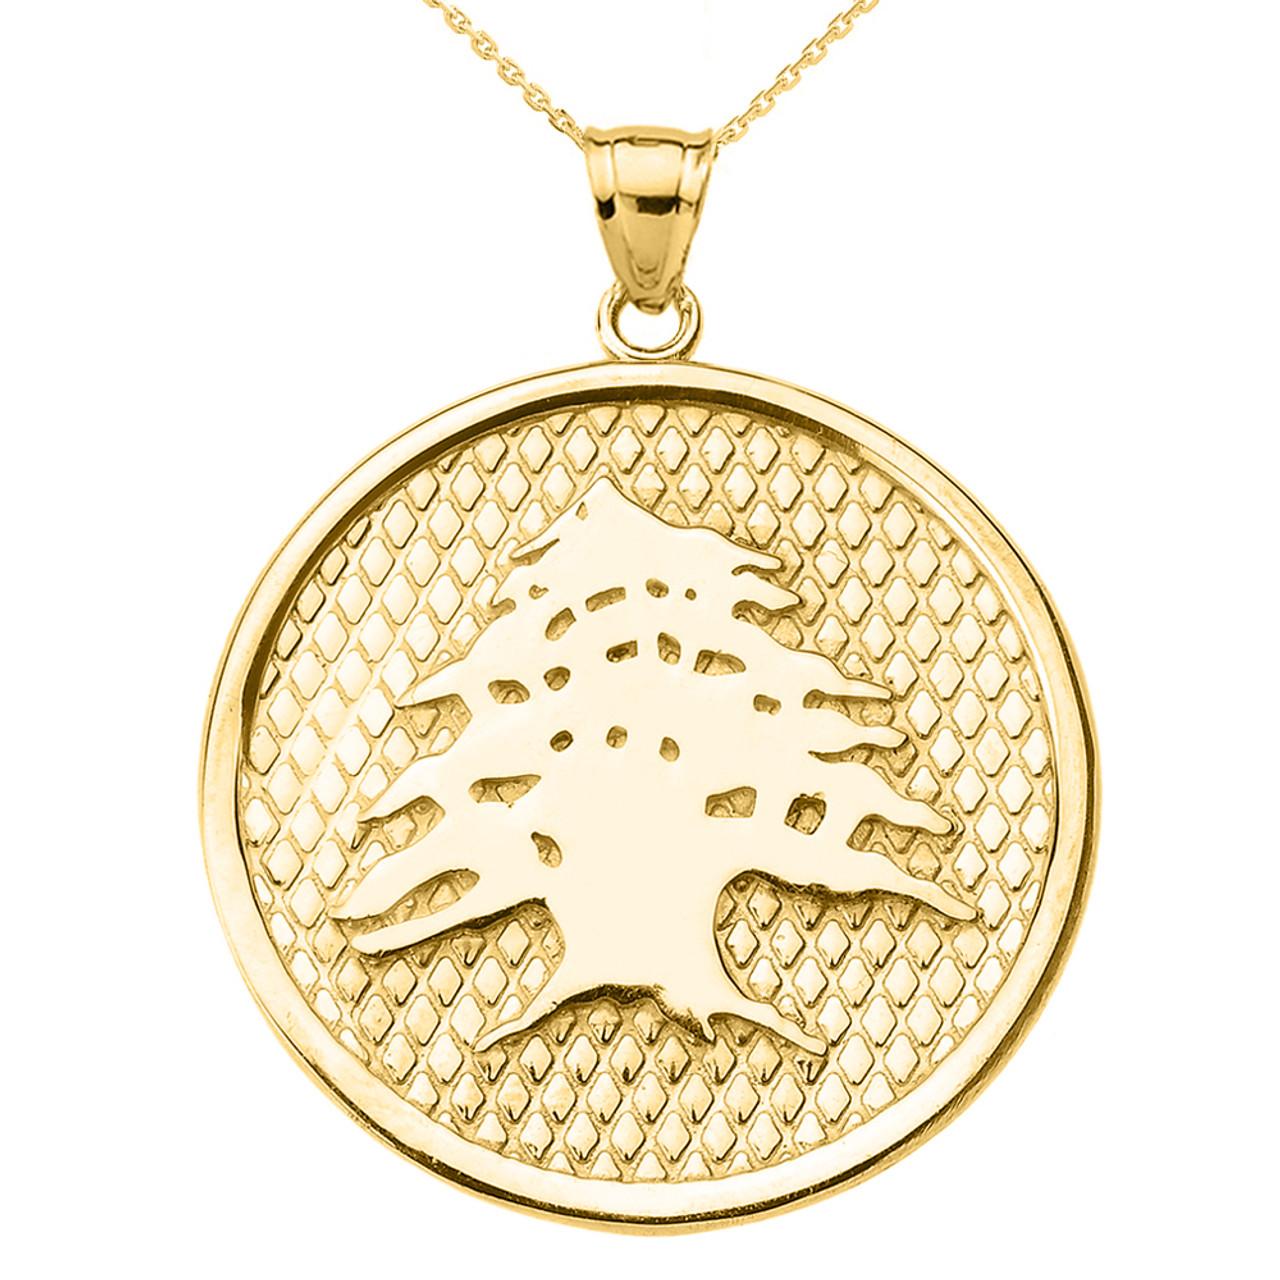 yellow gold lebanese cedar tree round pendant necklace. Black Bedroom Furniture Sets. Home Design Ideas